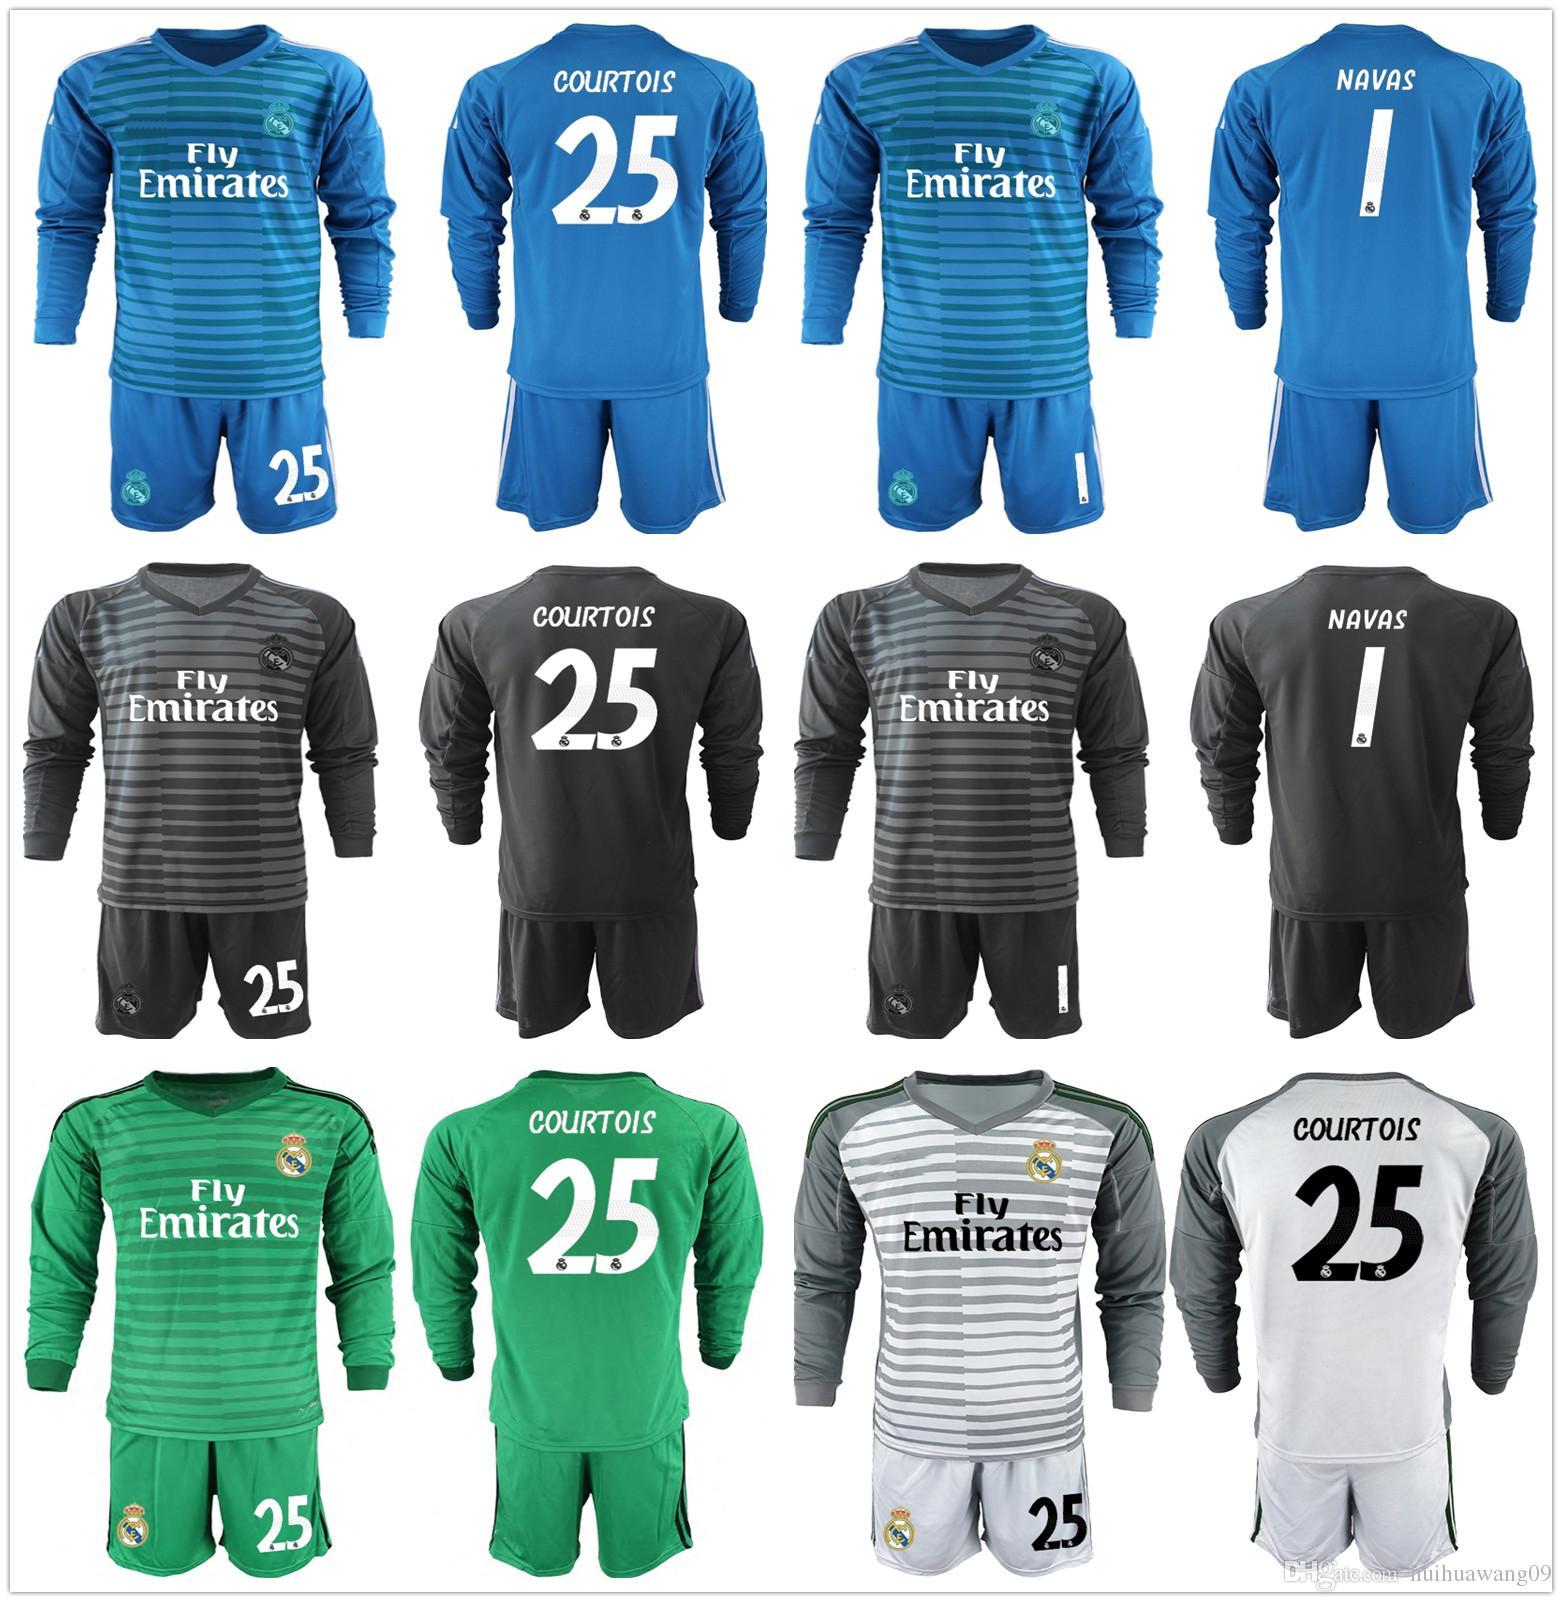 Compre 2018 2019 Conjunto De Fútbol De Real Madrid De Manga Larga Portero  Kit Keylor Navas 25 Portero De Courtois Camiseta De Mangas De Bale Del  Uniforme De ... 2d26e5ab19a71